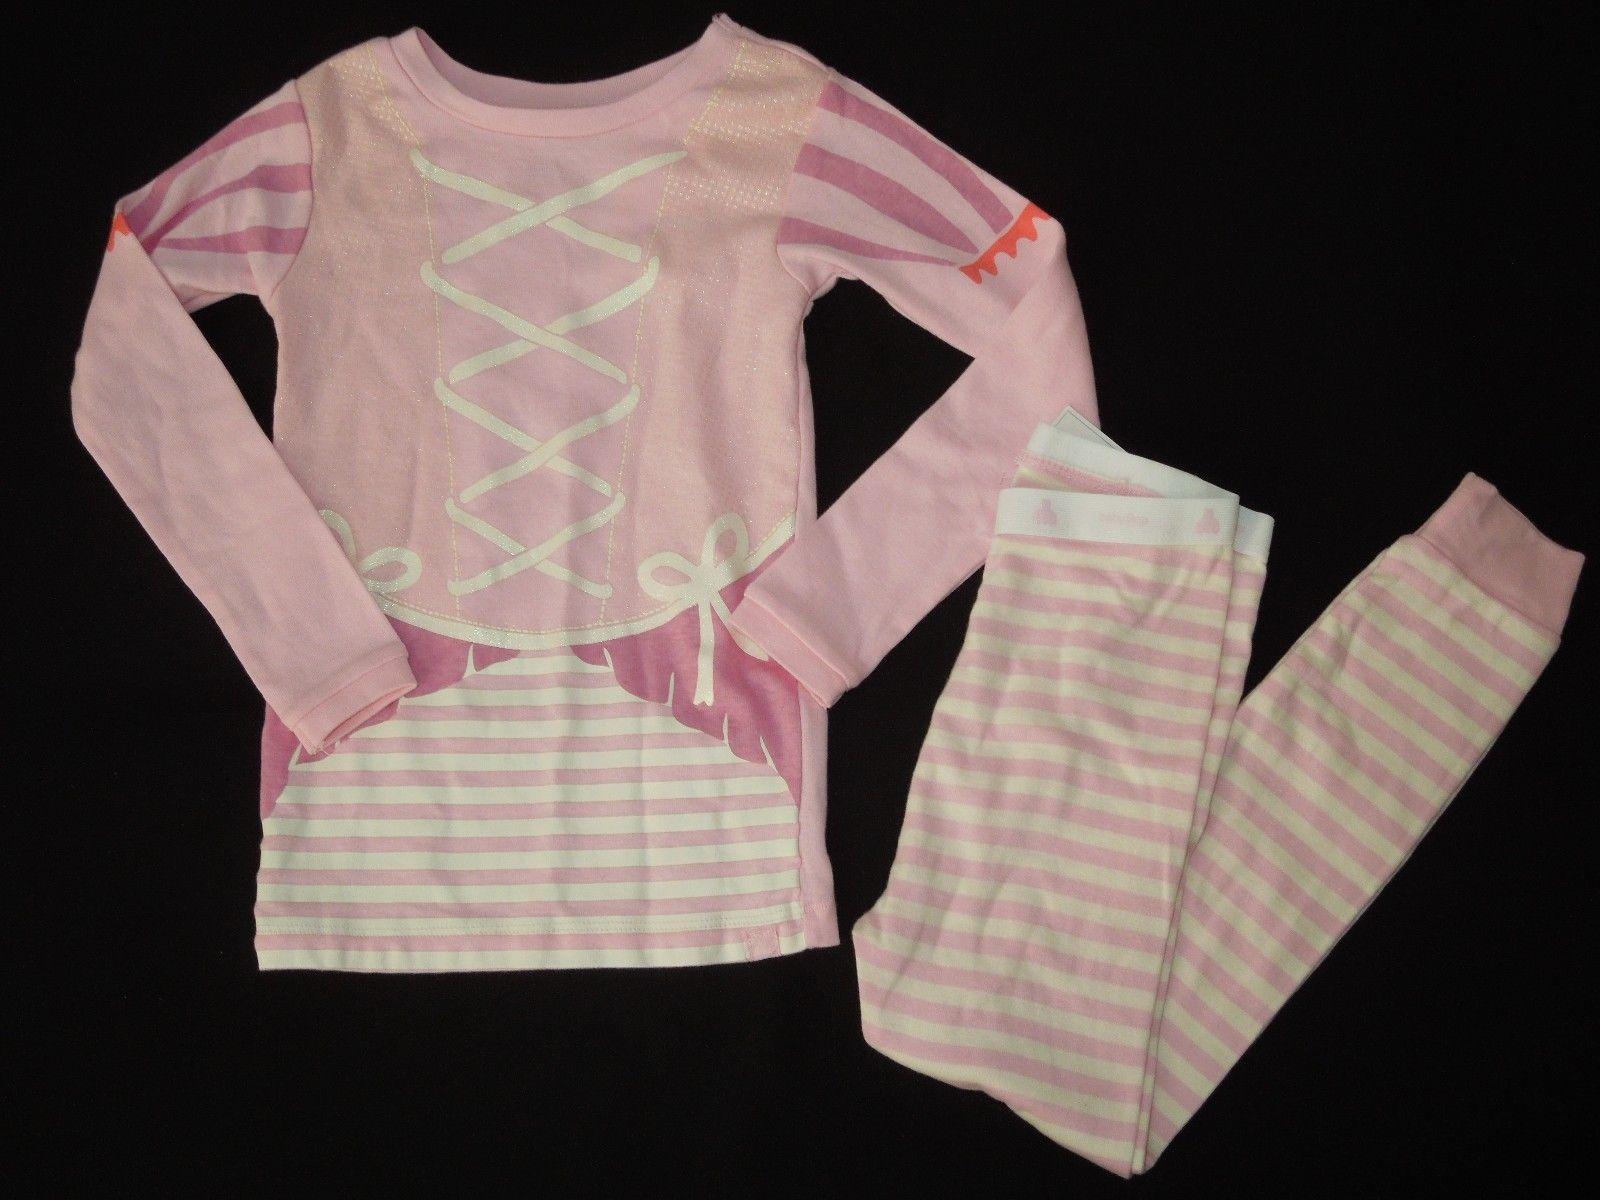 387d8aed8 Baby Gap pajamas NWT Fairy Princess glitter and 50 similar items